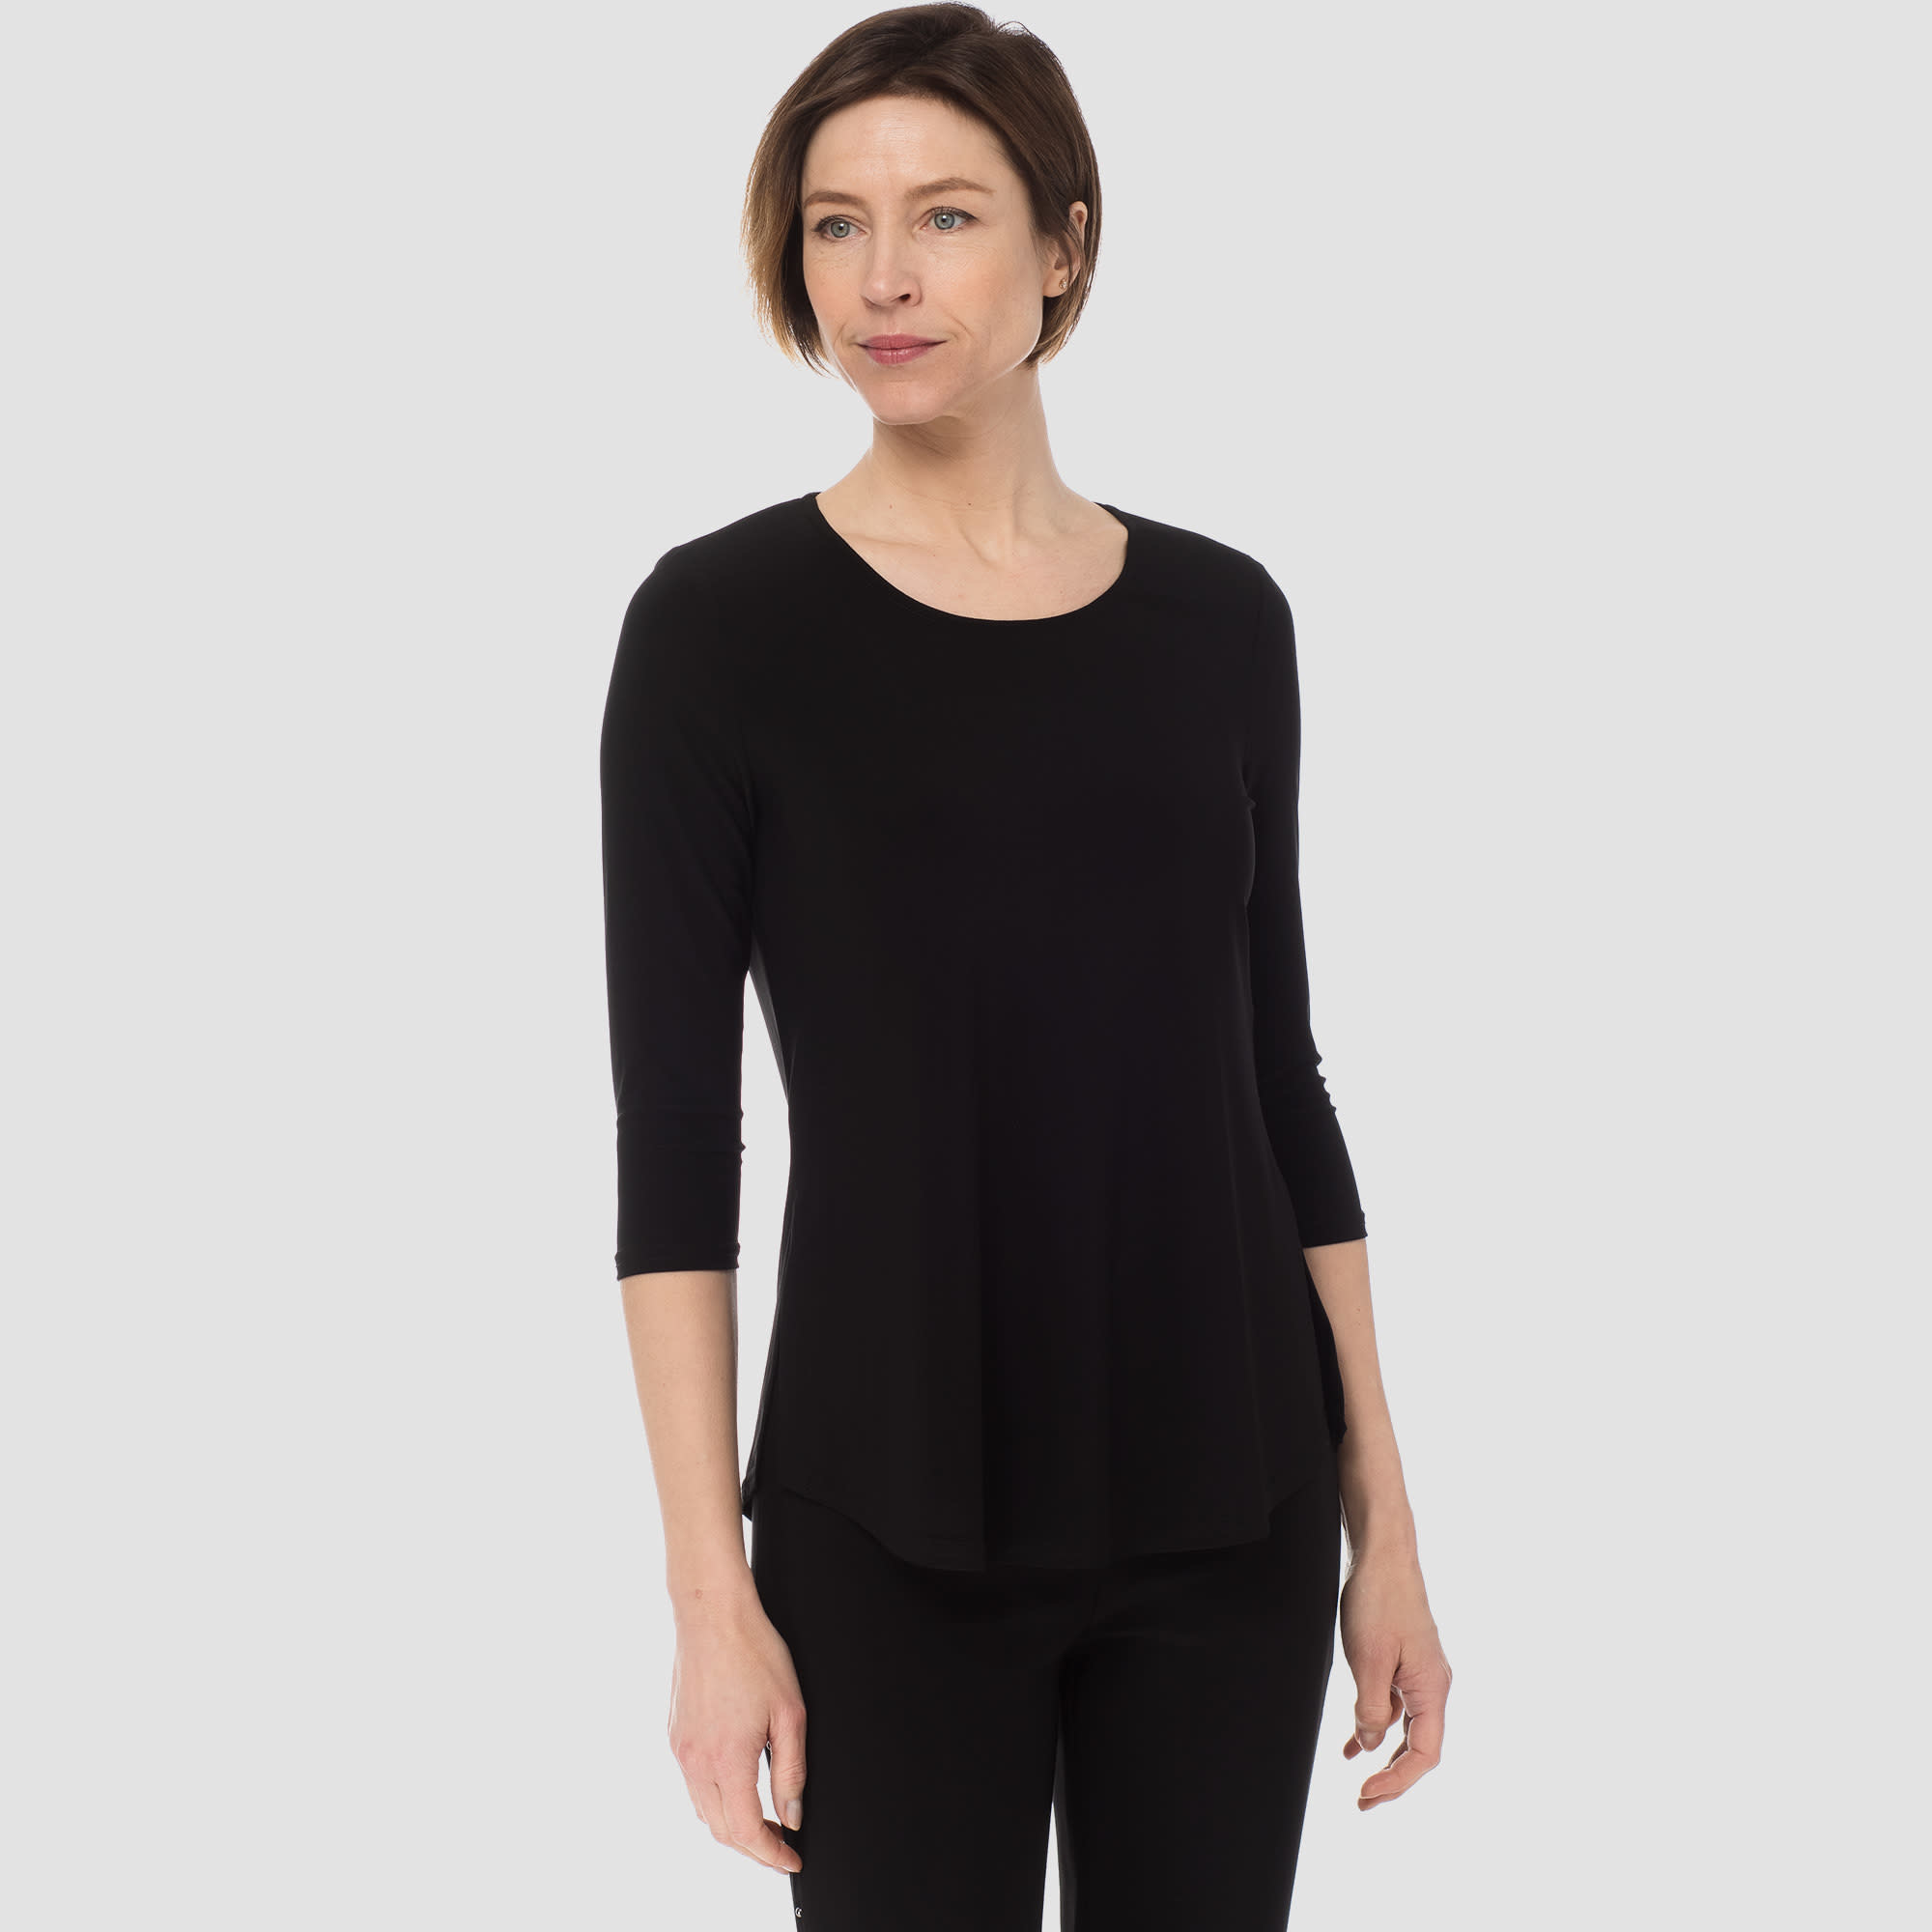 Basic 3/4 Sleeve Top - Black